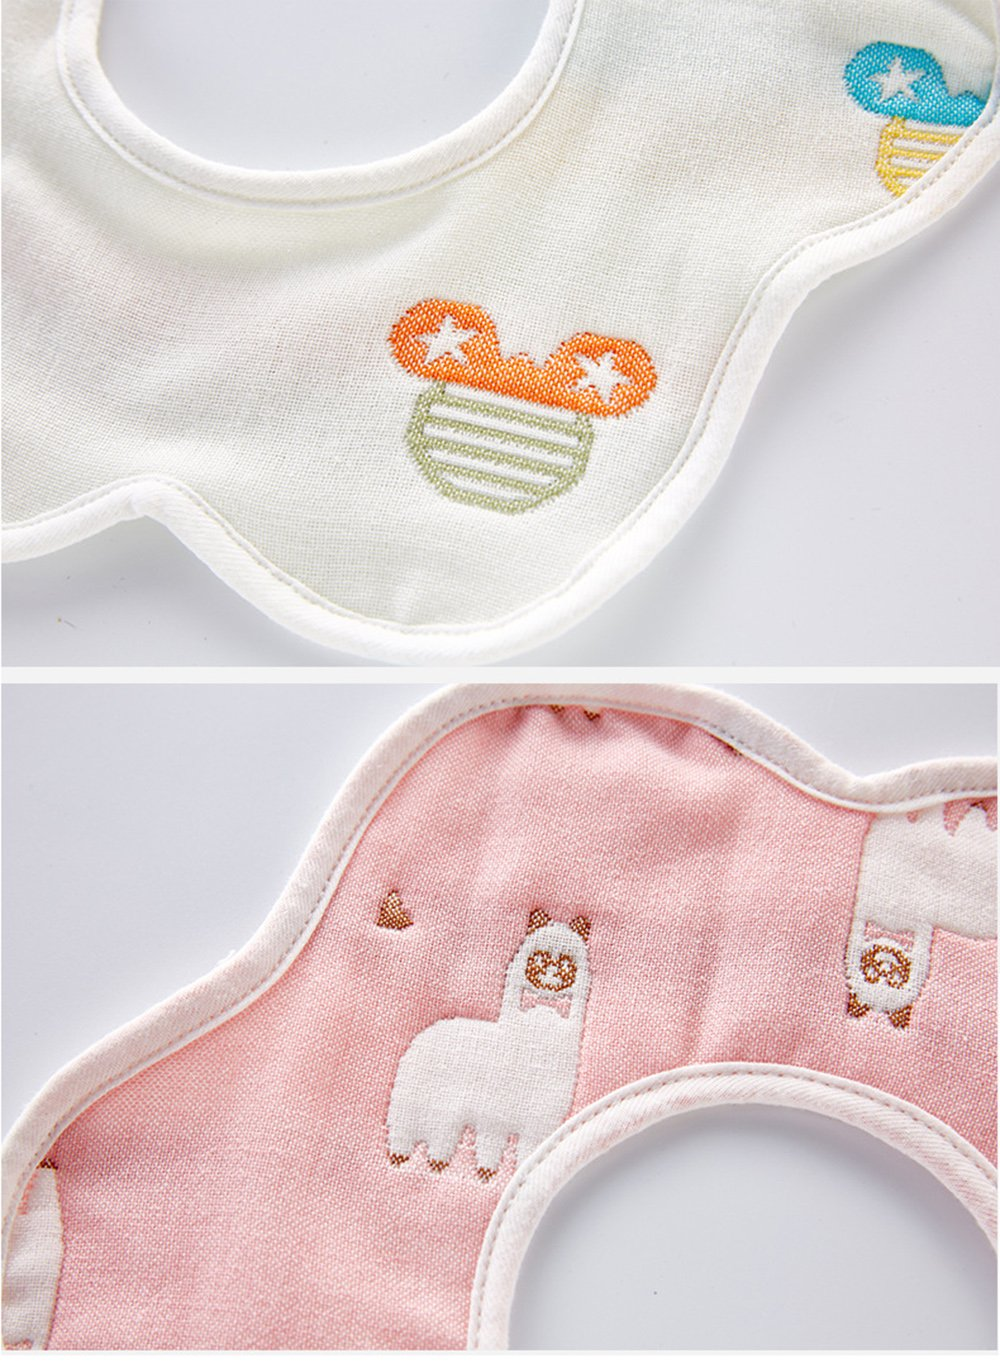 Hocaies Toddler beb/é impermeable babero de manga larga babero con mangas y bolsillo